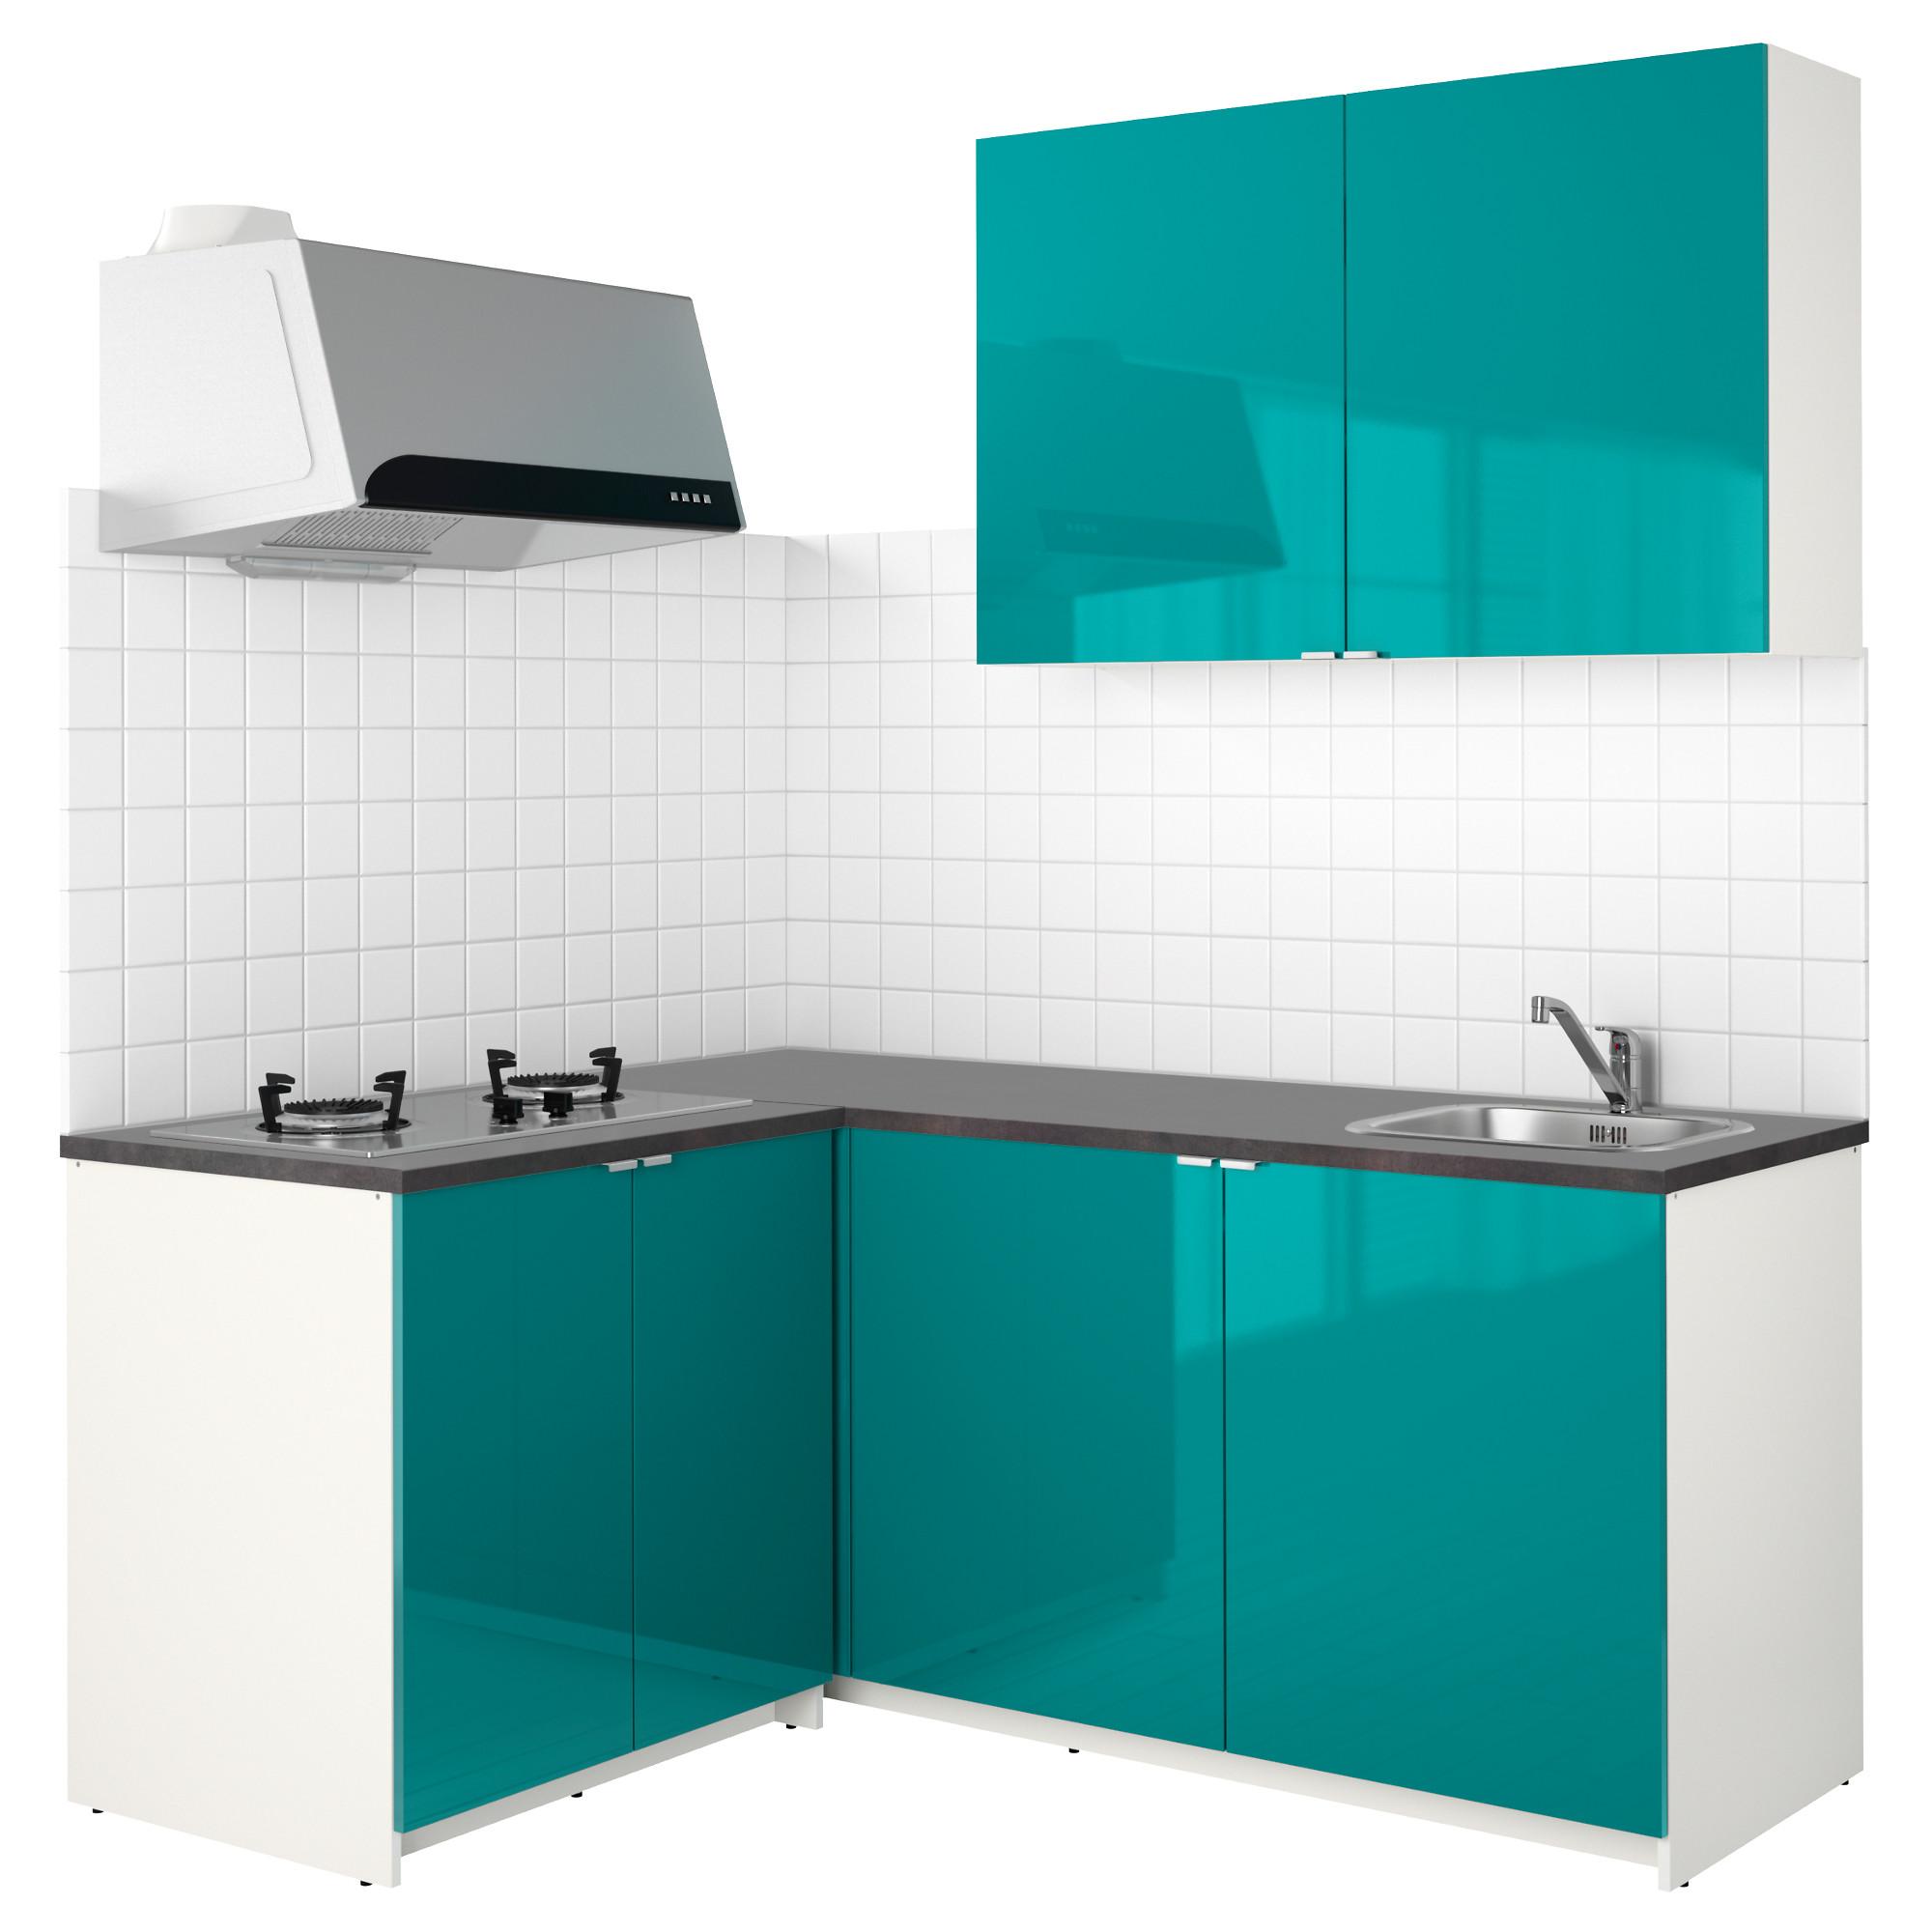 Knoxhult Ikea Kitchen Cabinets Komnit Store